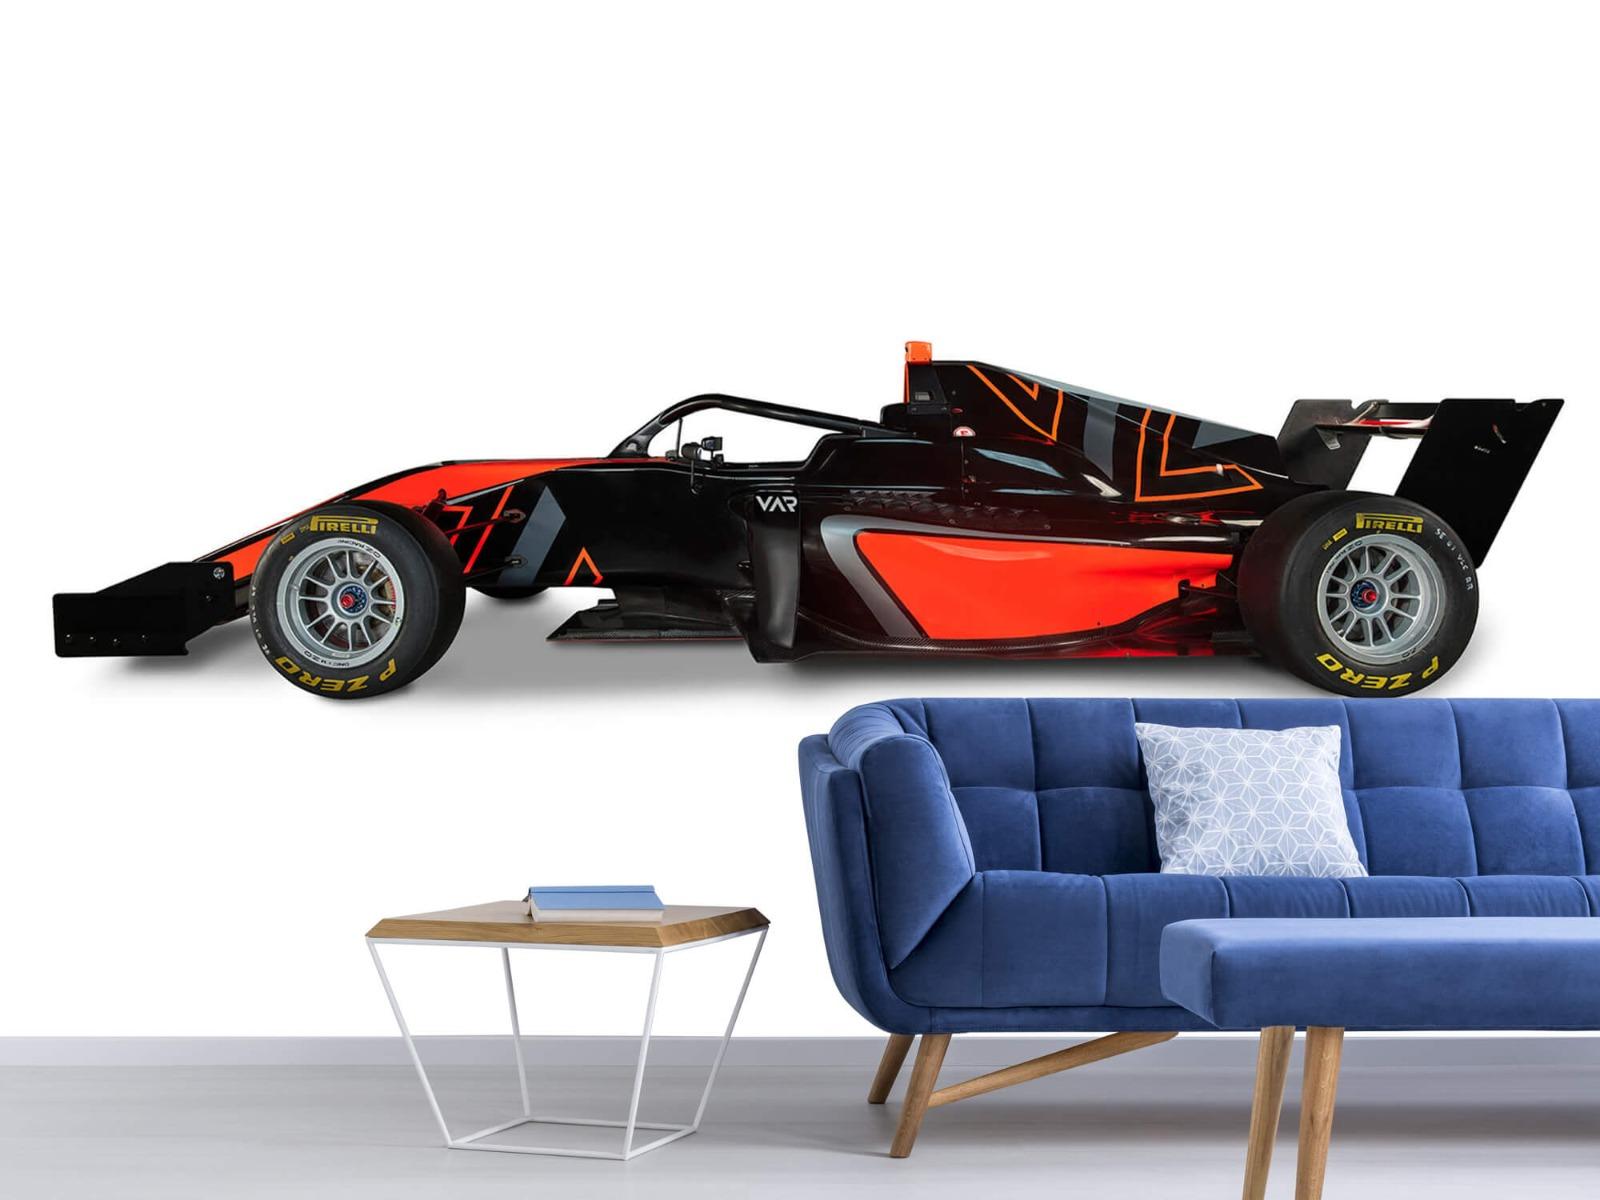 Sportauto's - Formule 3 - Lower side view - Computerruimte 5